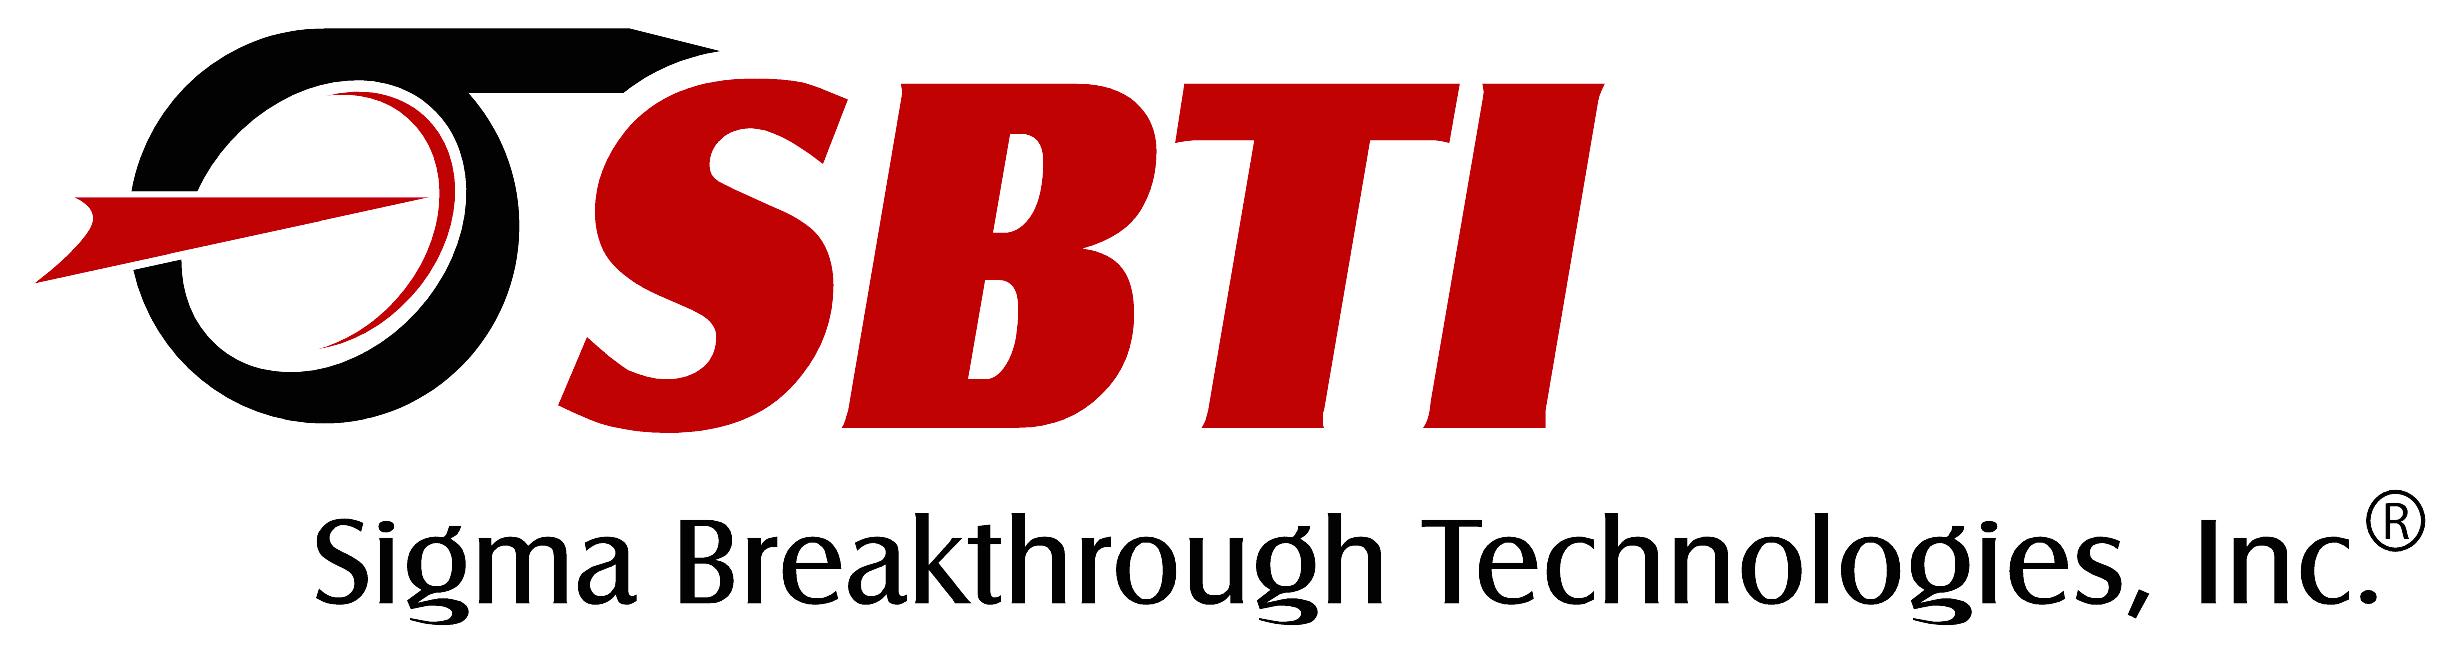 Sigma Breakthrough Technologies, Inc.